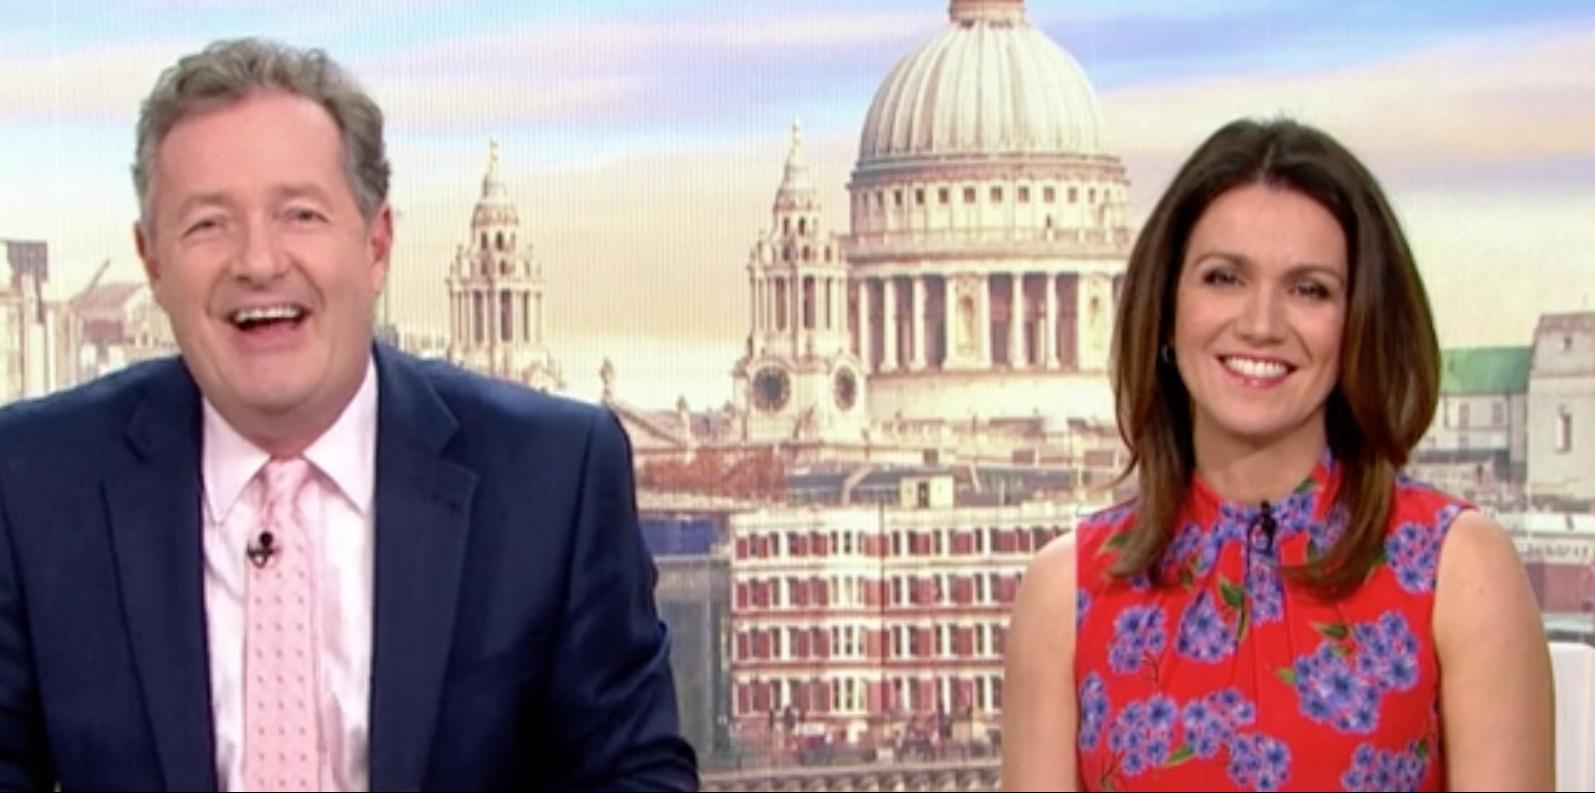 Cheeky Piers Morgan makes a saucy quip about Susanna Reid's sex life